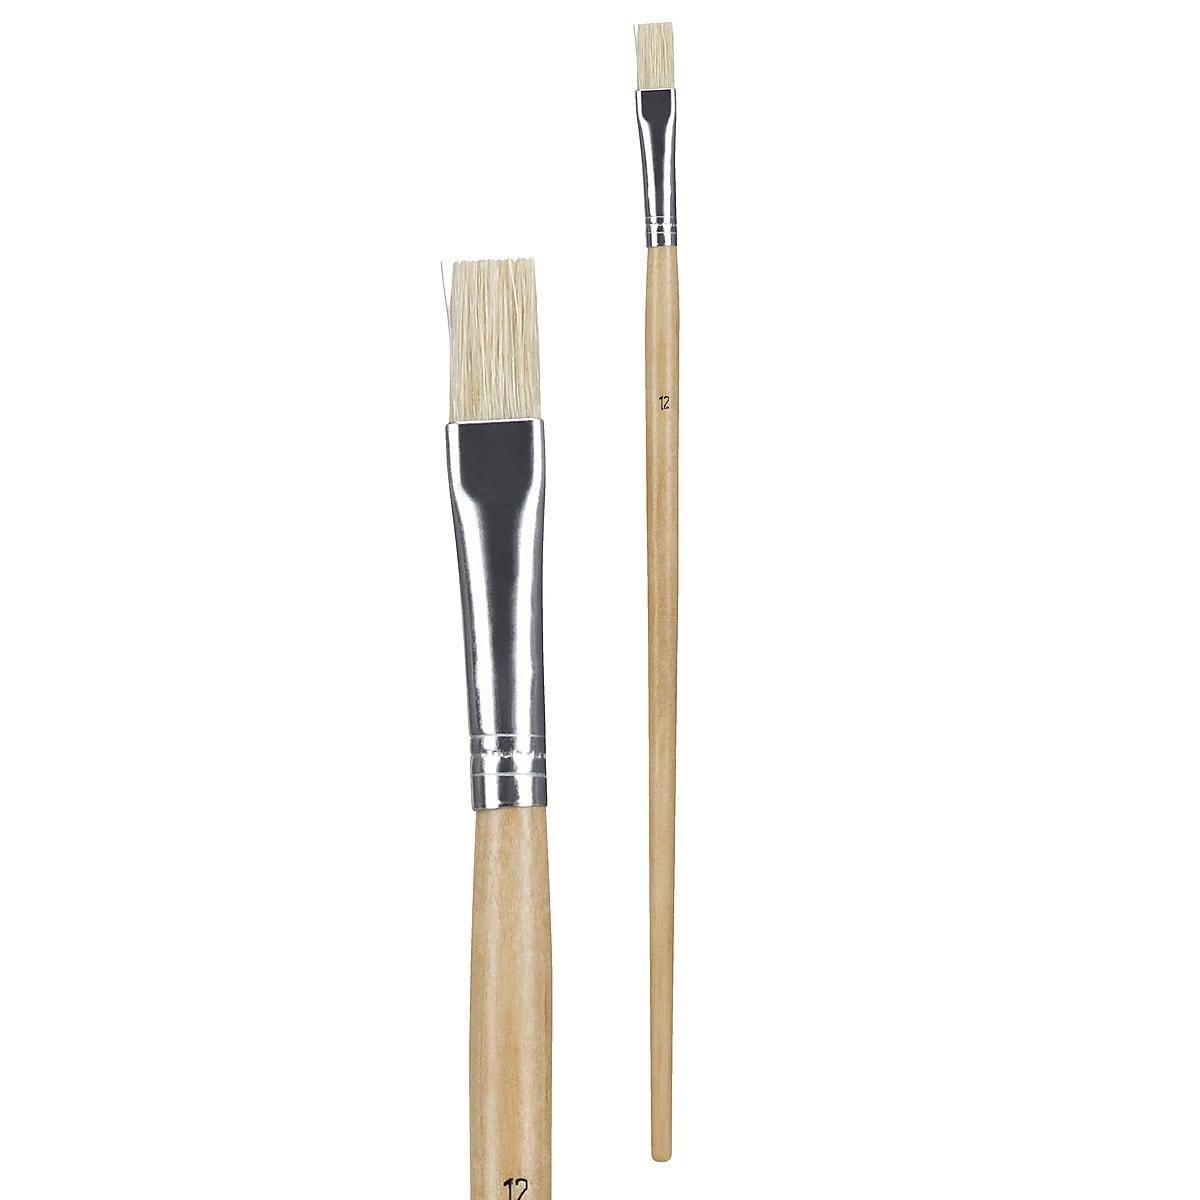 Pensel olja/akryl Sang